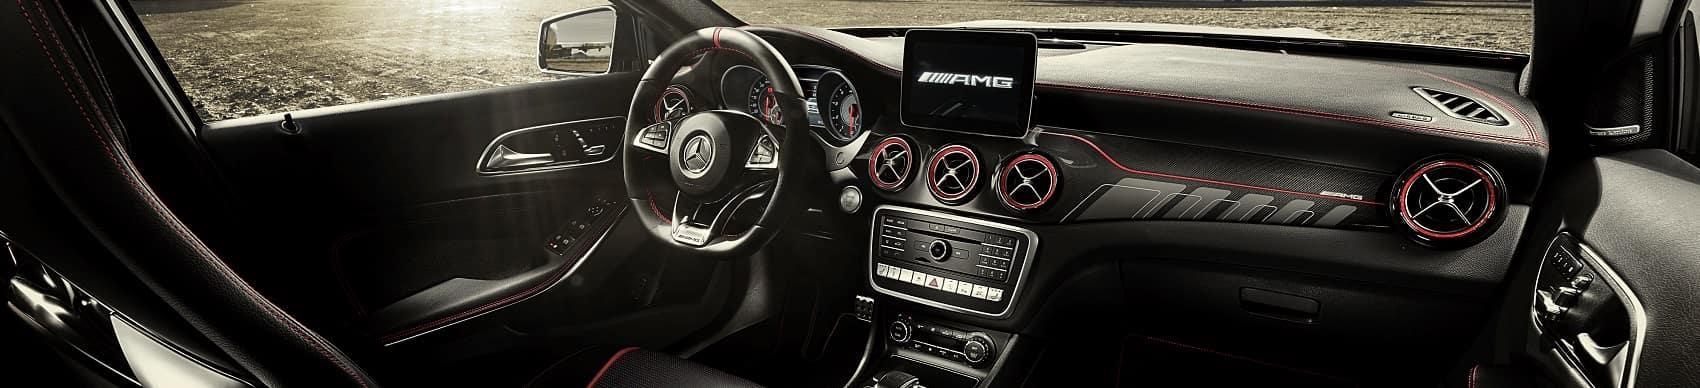 Mercedes GLA Technology